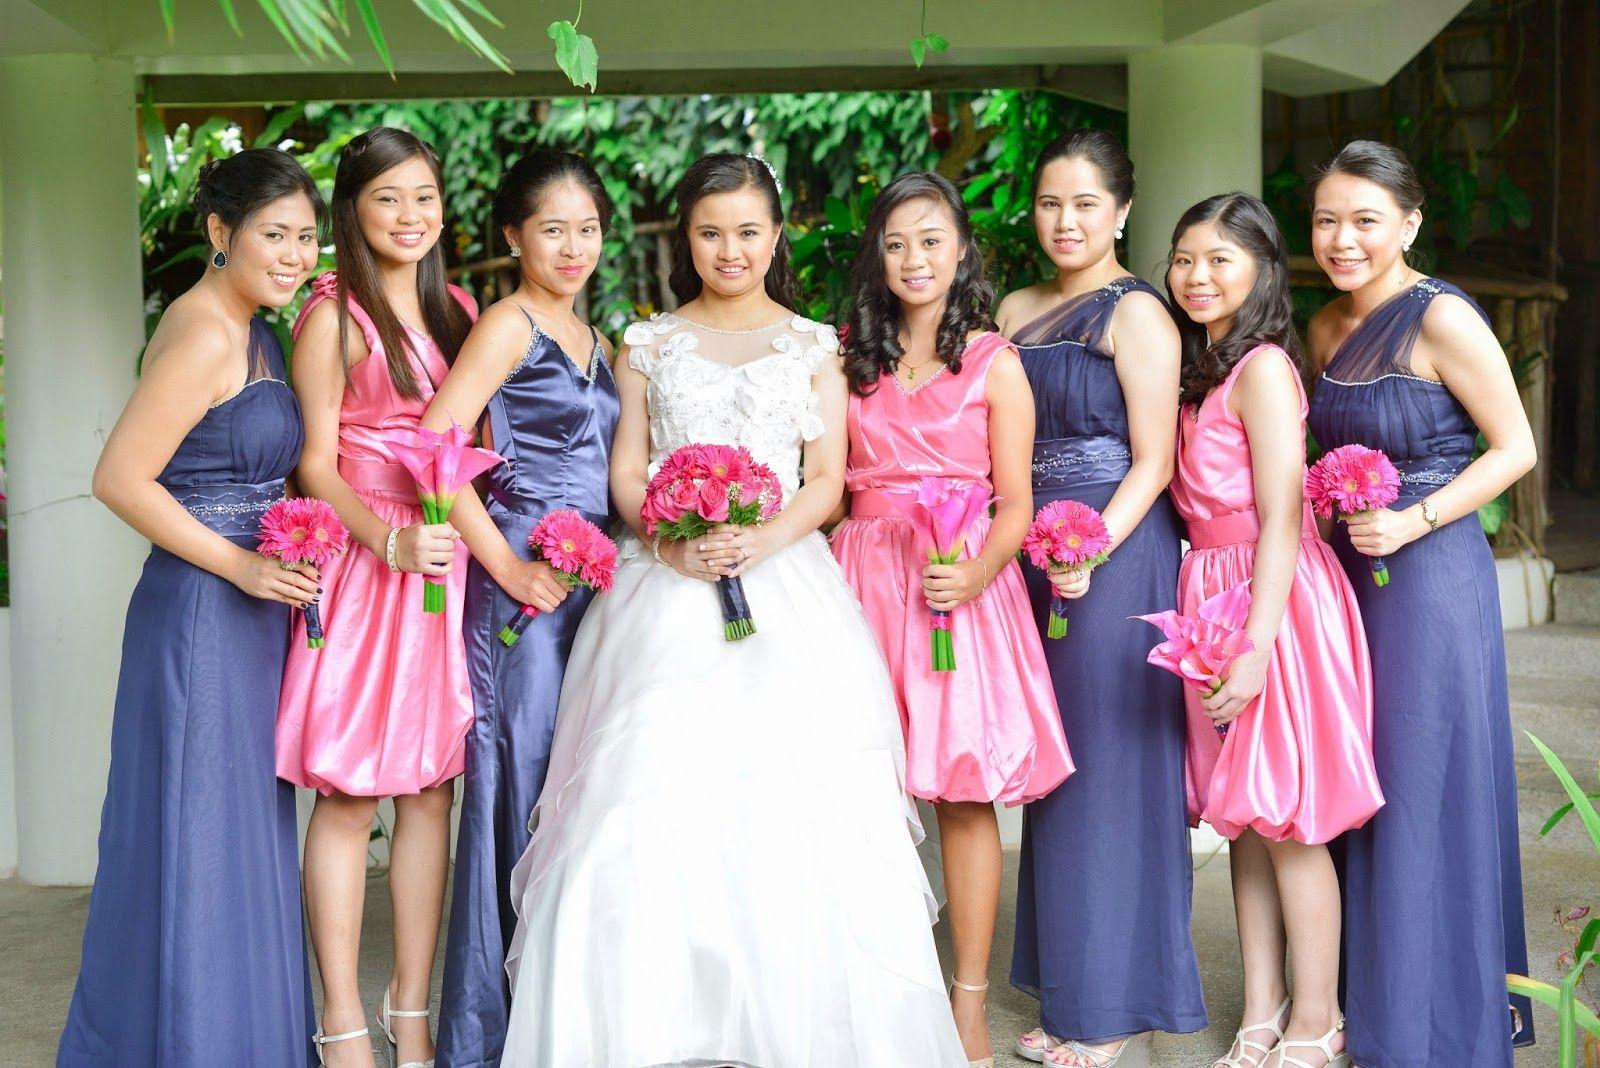 Wedding Planning with Pinterest   Pinterest   Wedding and Weddings